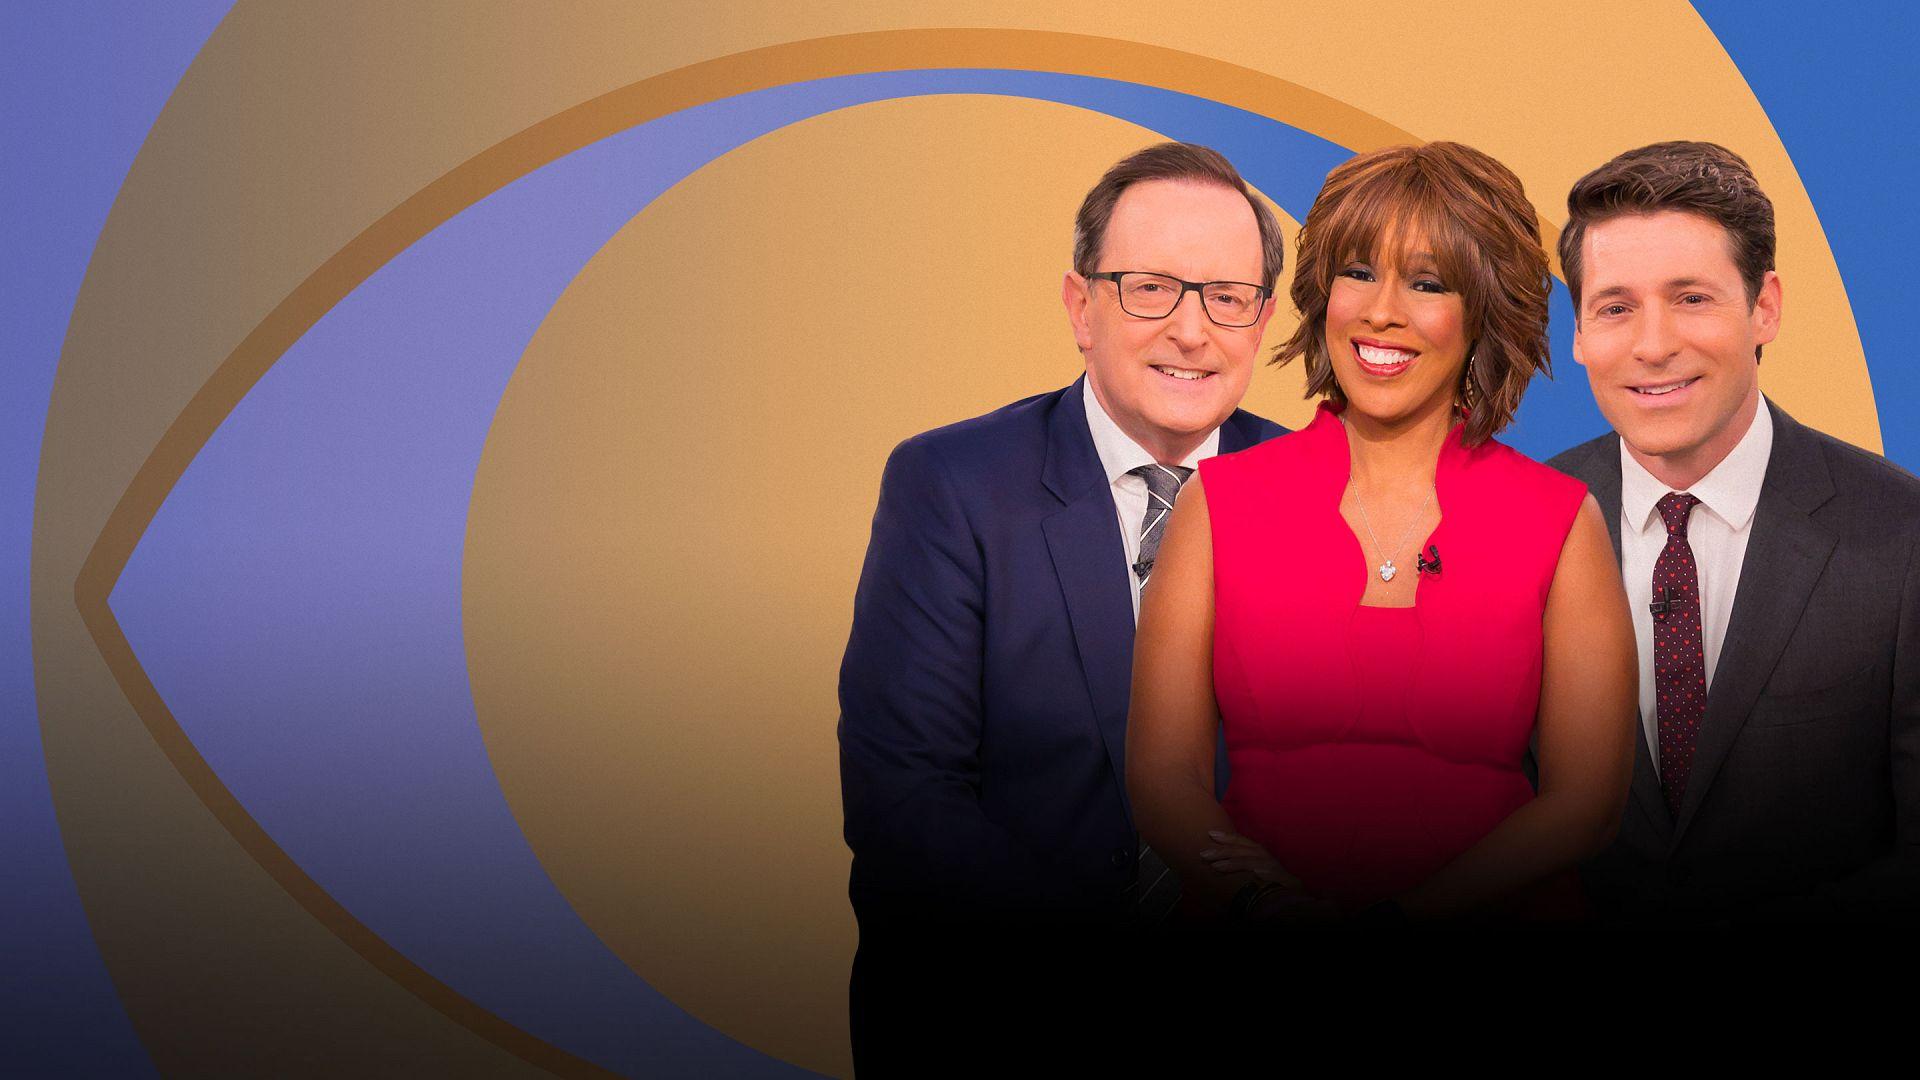 Morning Show Halloween 2020 CBS This Morning   CBS.com